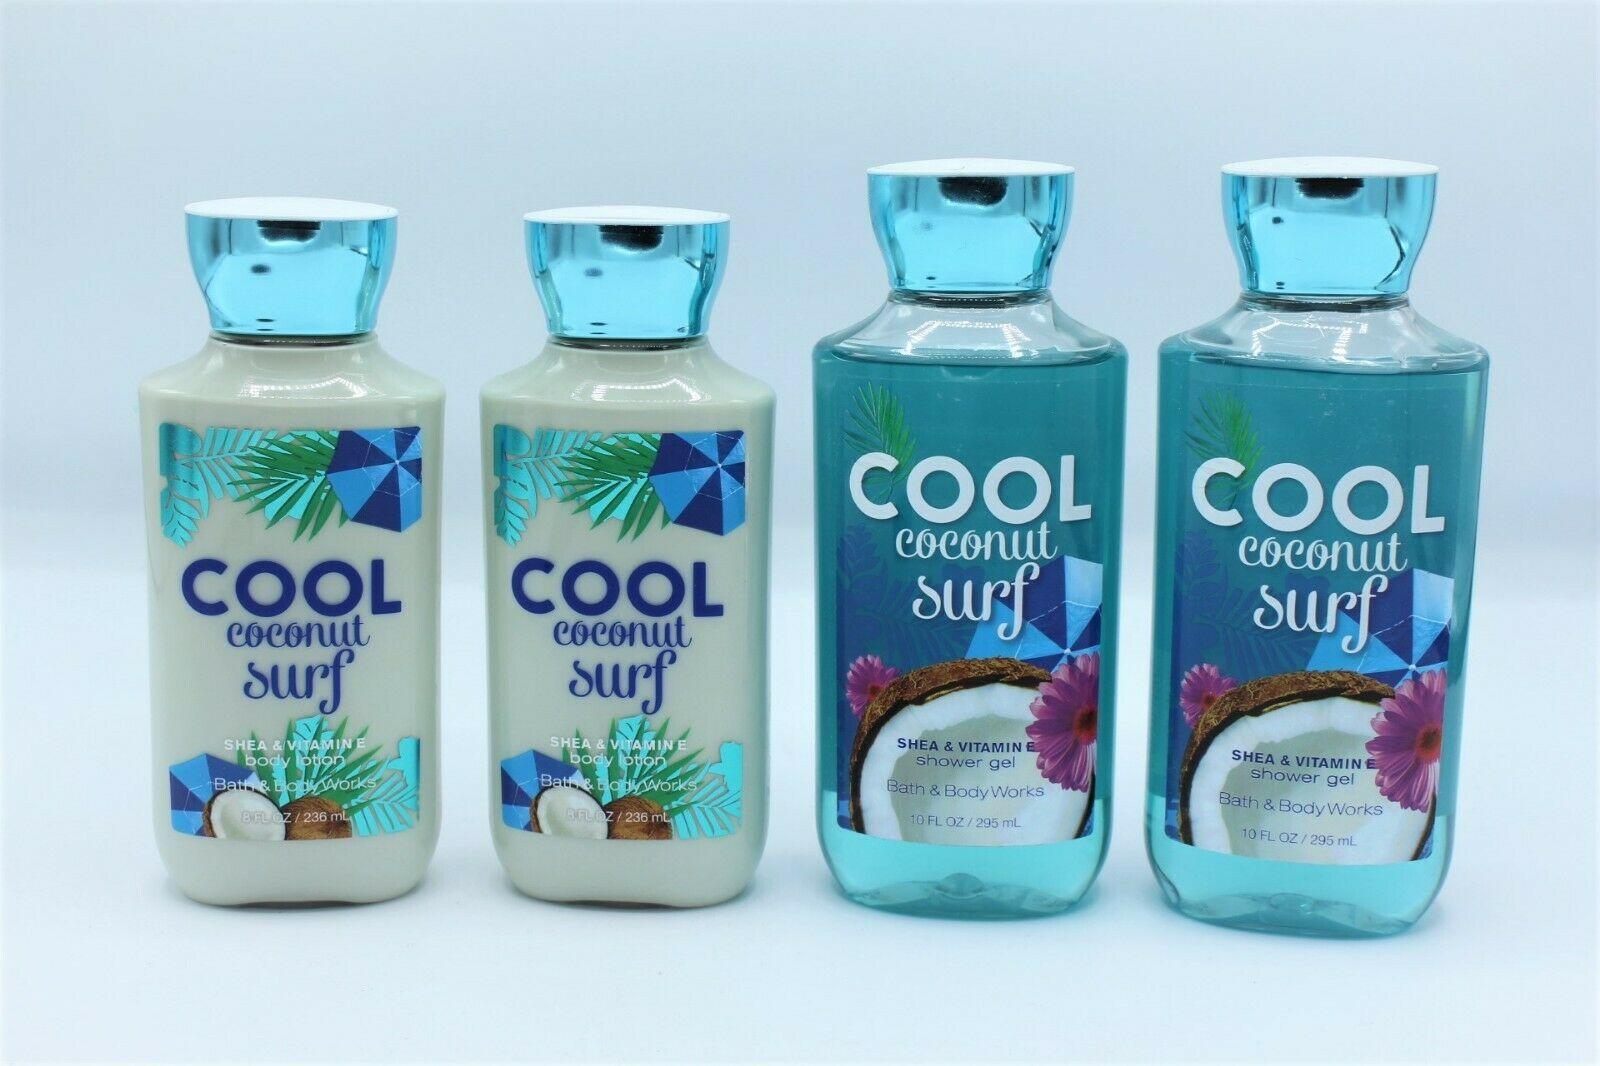 Bath & Body Works Cool Coconut Surf Body Lotion Shower Gel Lot of 4